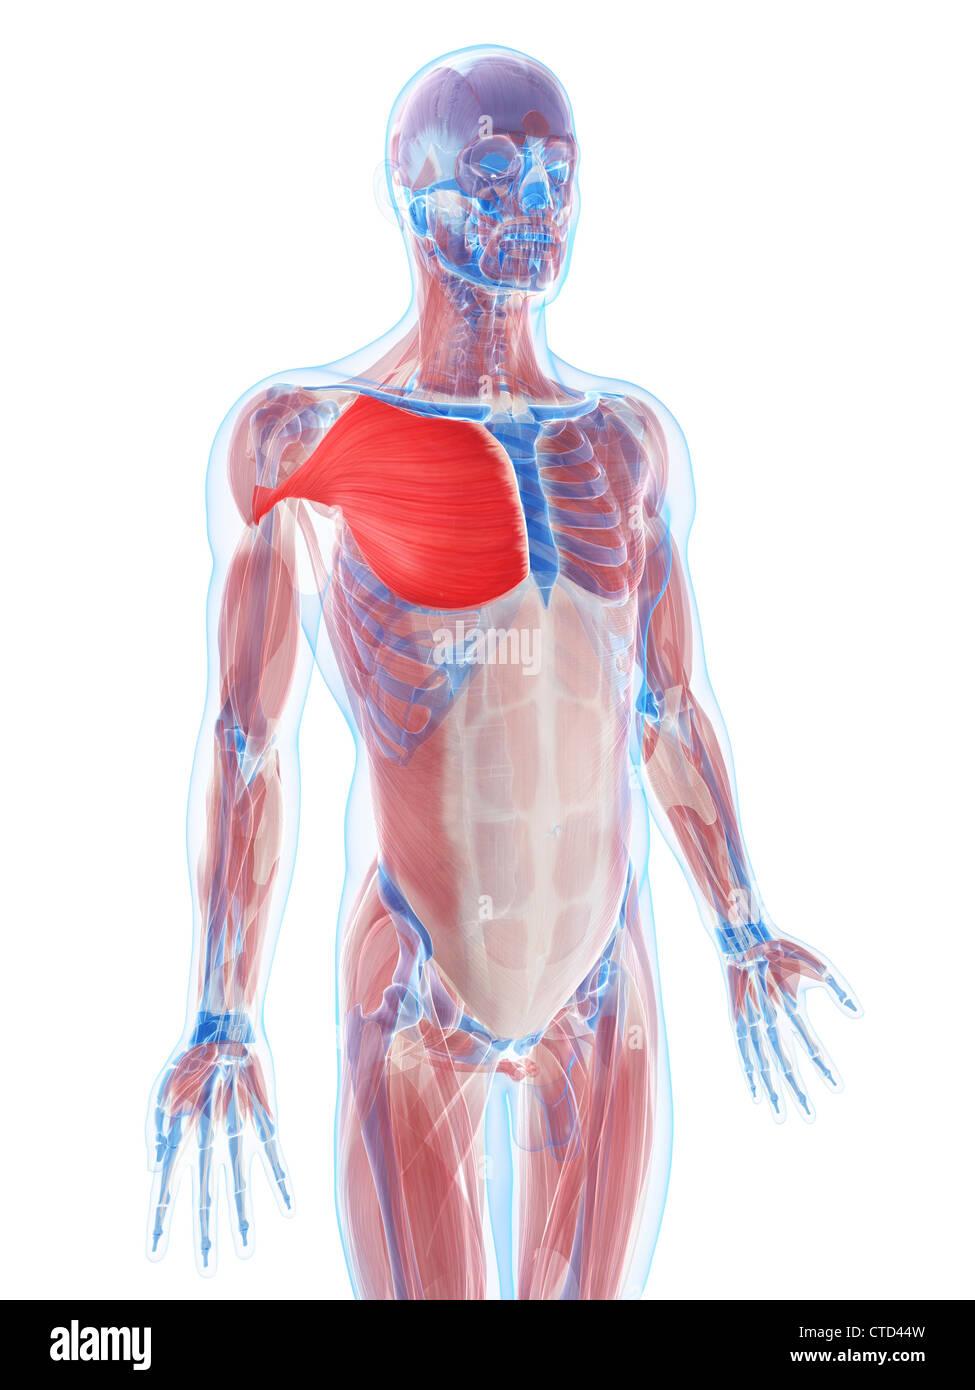 Pectoralis major muscle artwork Stock Photo: 49461129 - Alamy